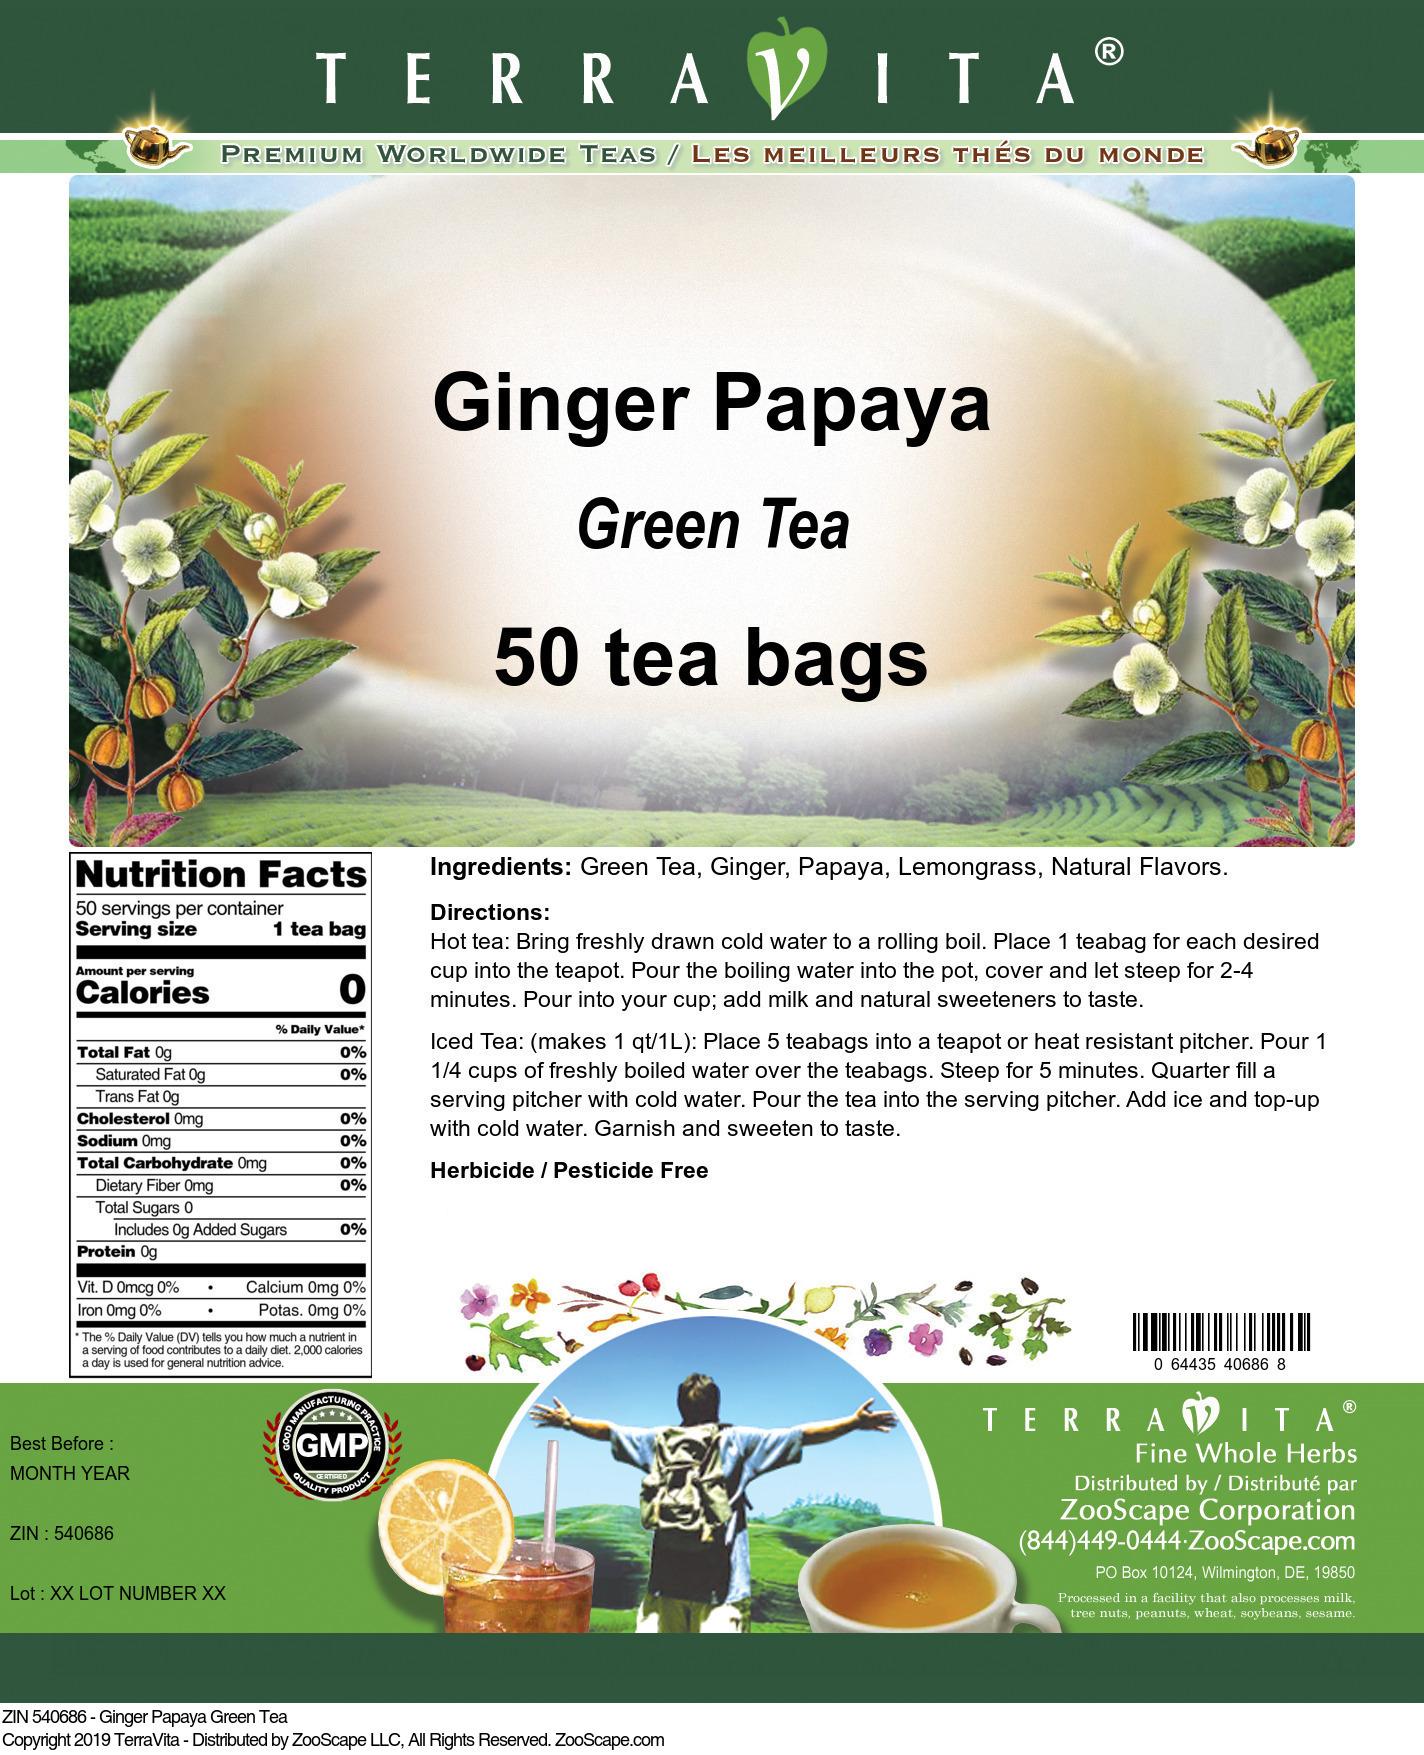 Ginger Papaya Green Tea